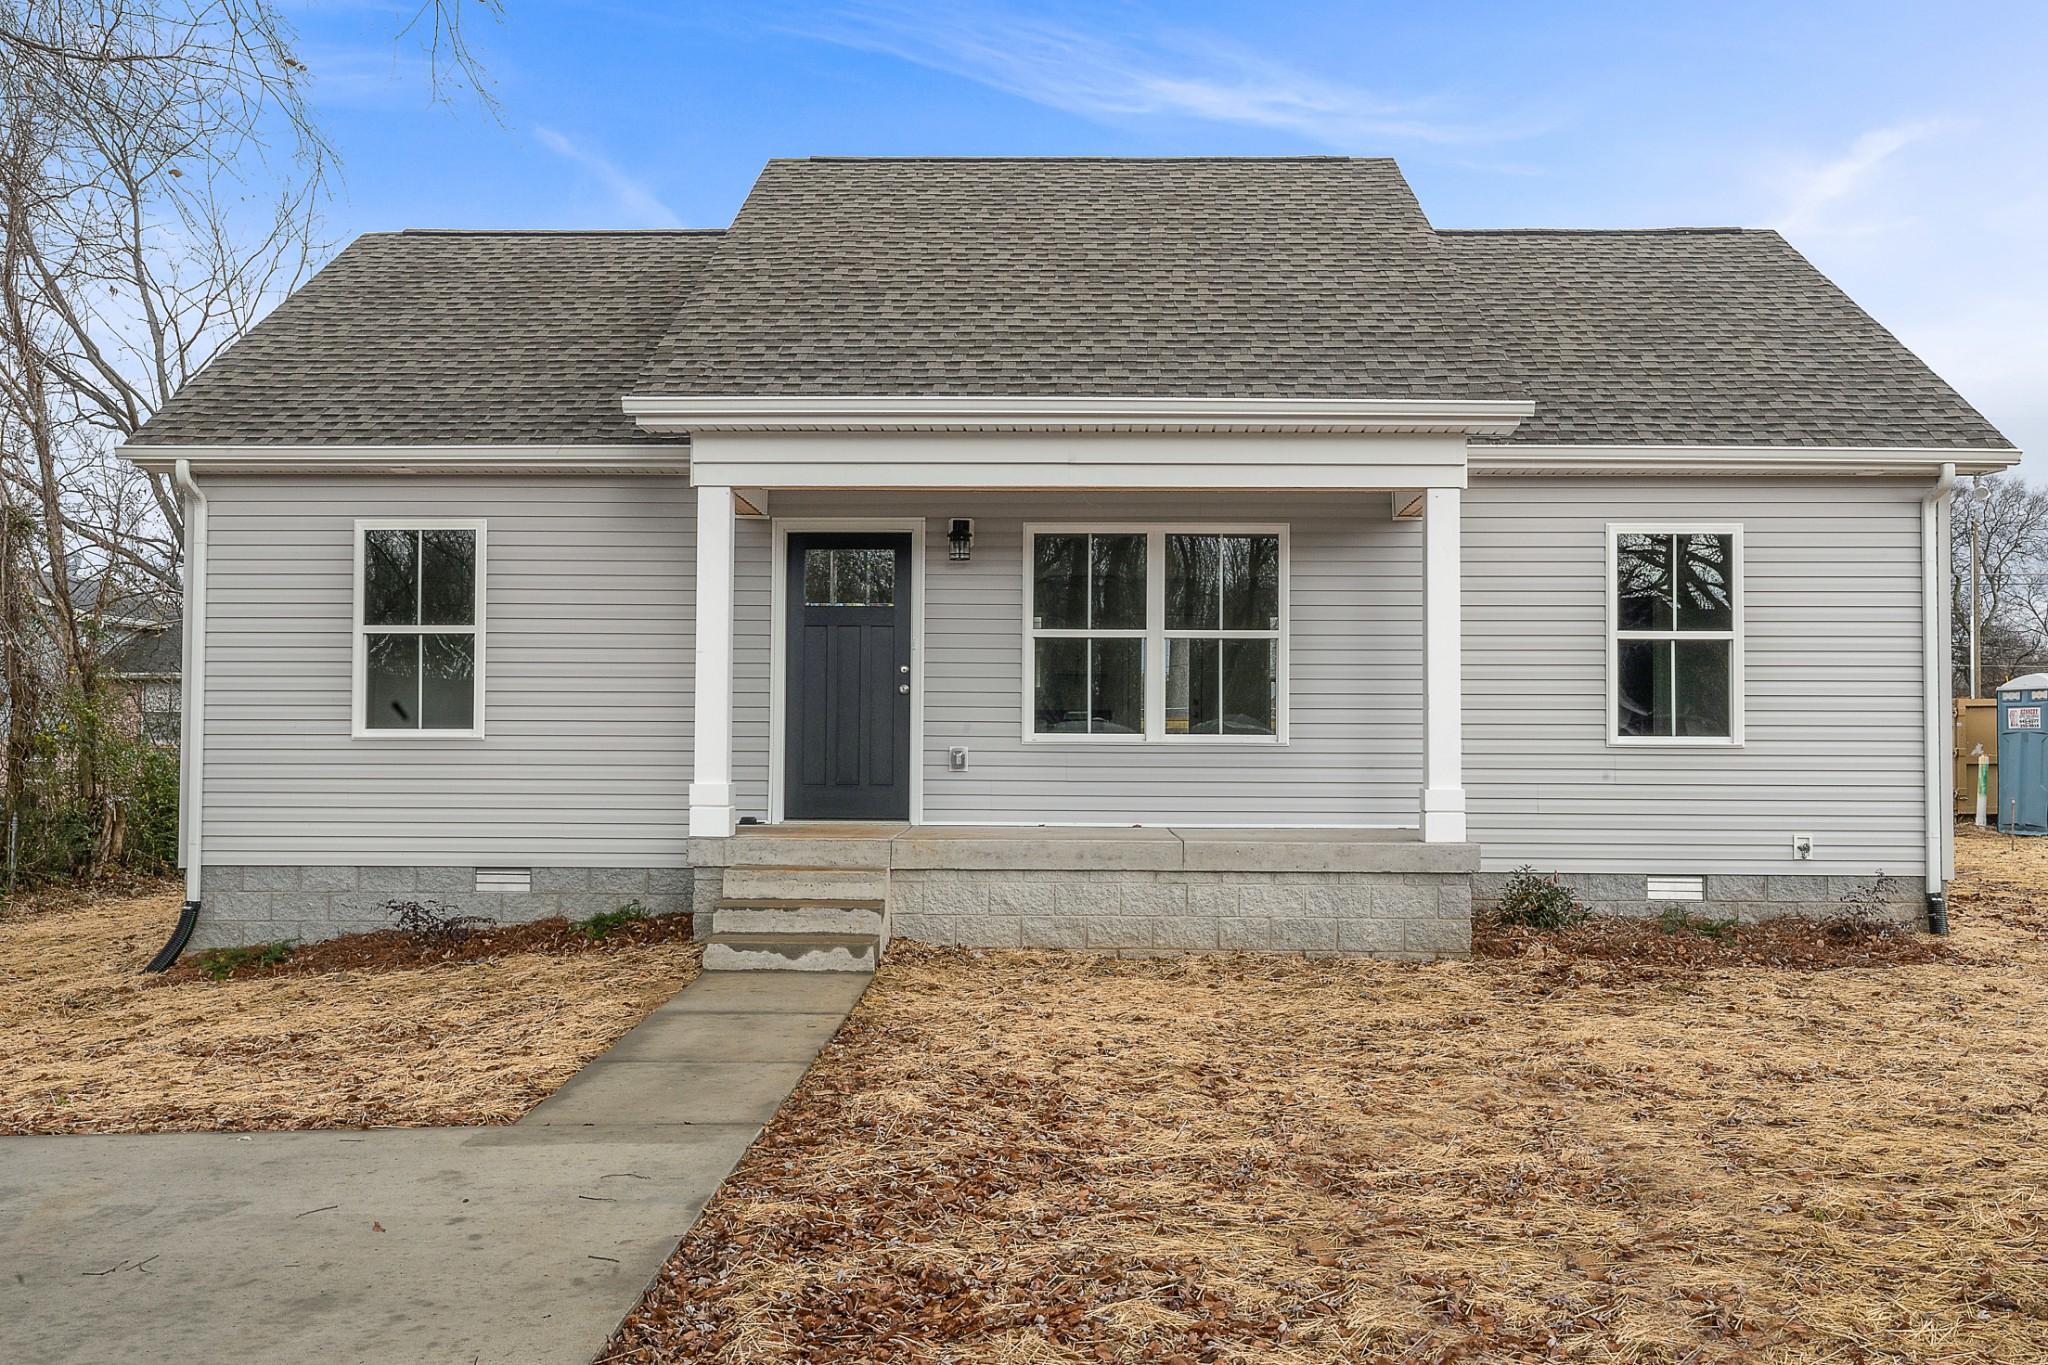 206 23rd Ave, E, Springfield, TN 37172 - Springfield, TN real estate listing